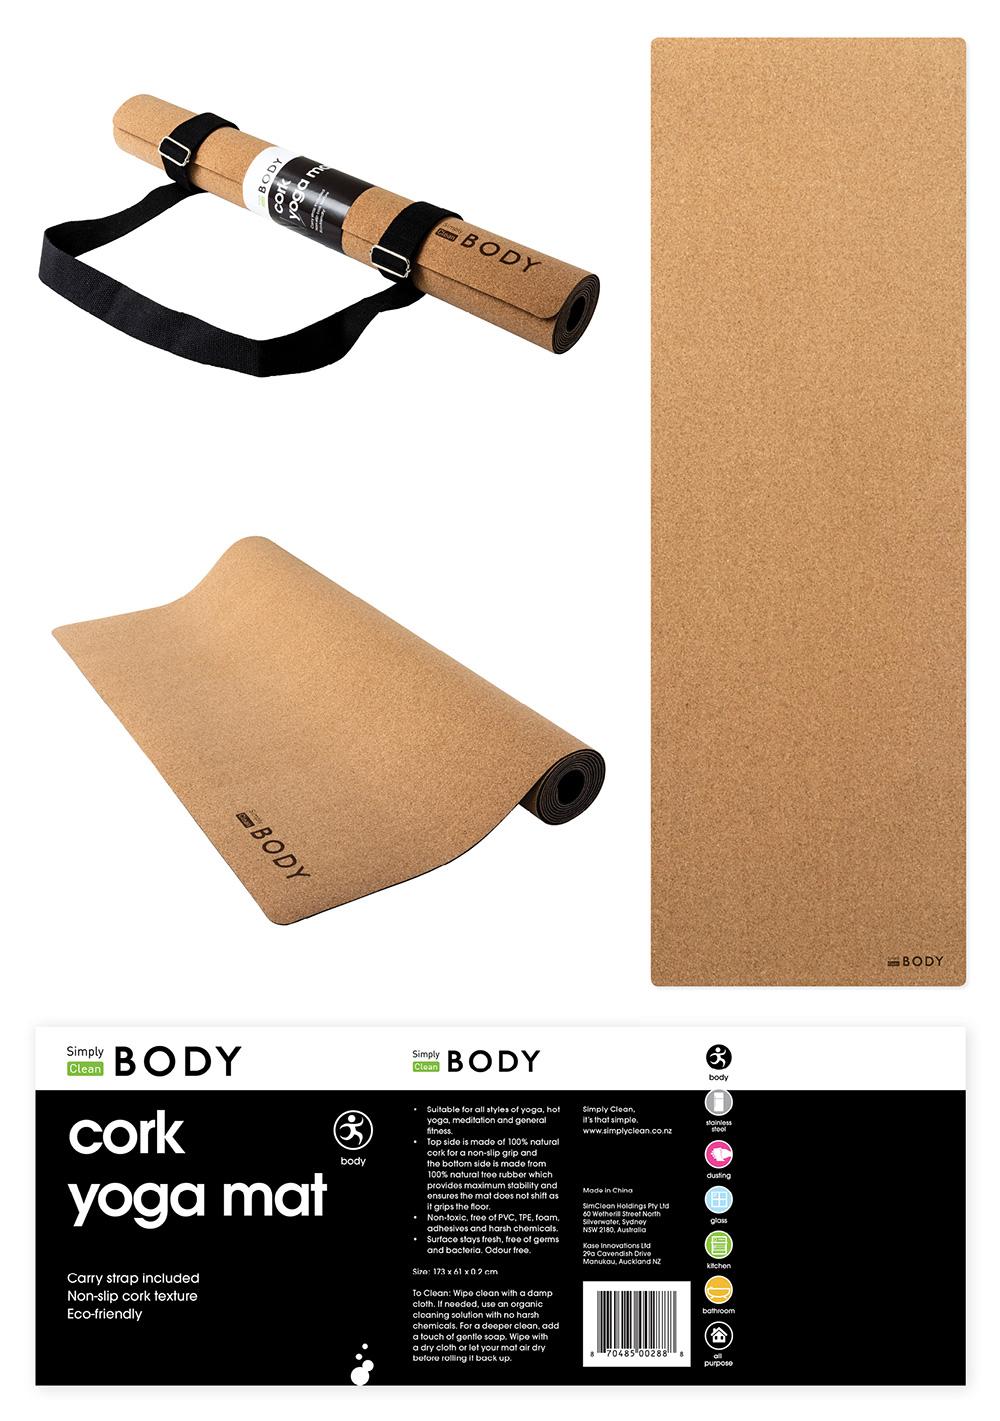 scb-graphic-design-003